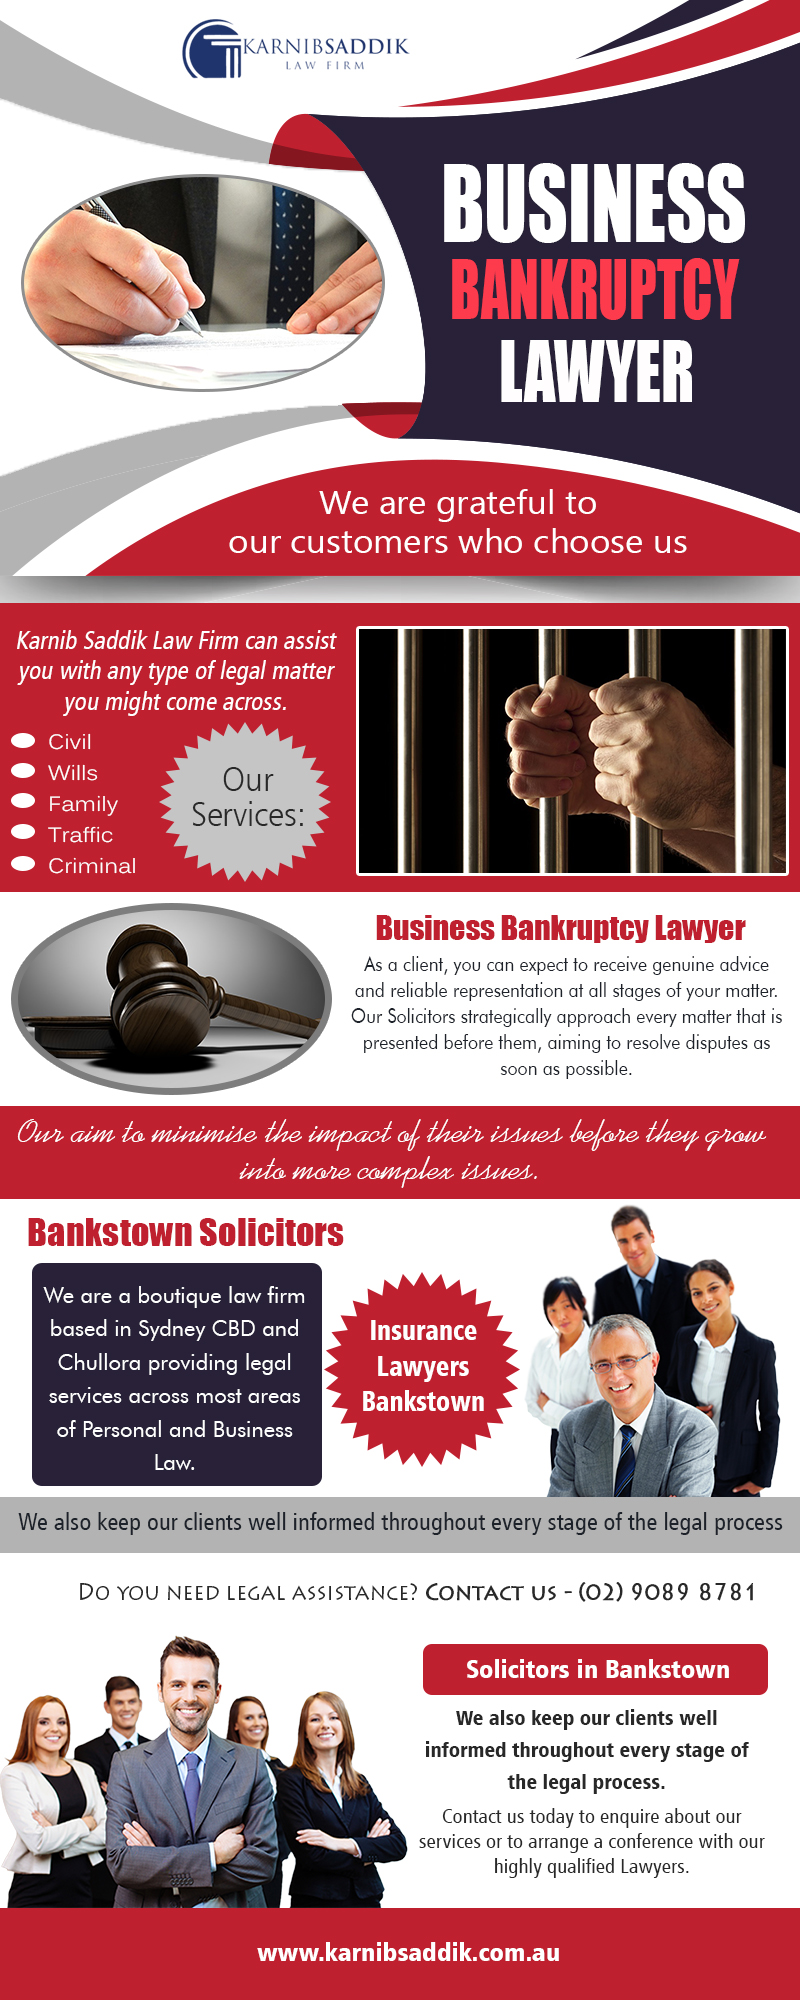 Business Bankruptcy Lawyer | Call-0290898781 | karnibsaddik.com.au